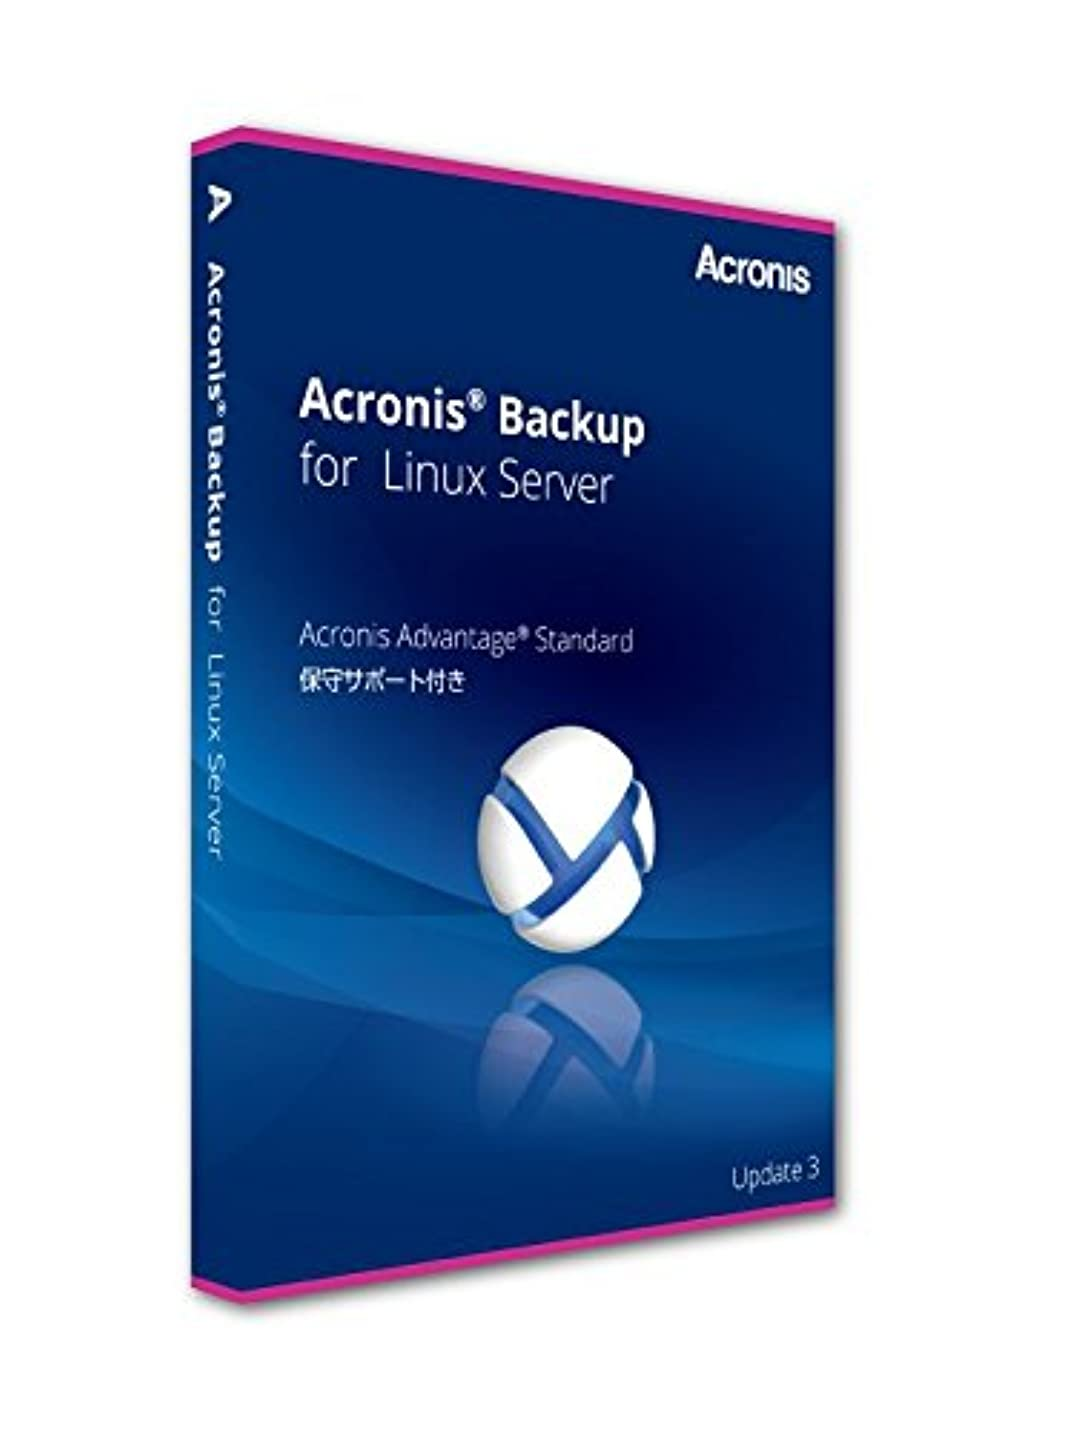 Acronis Backup for Linux Server (v11.5) incl. AAS BOX